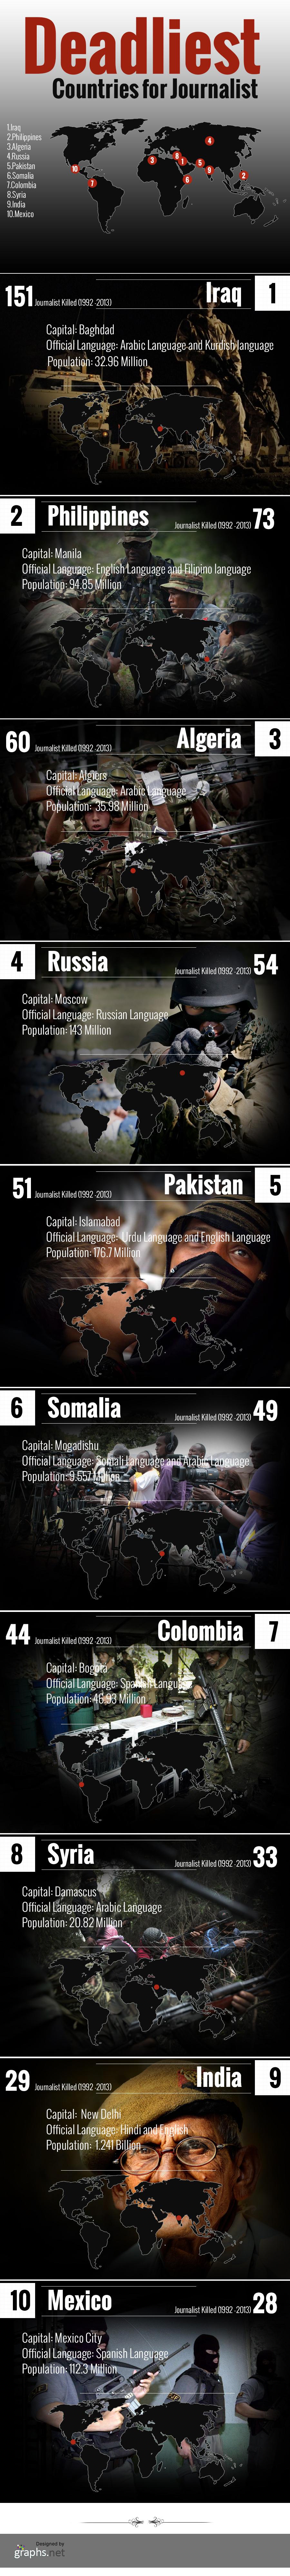 Deadliest Countries for Journalist